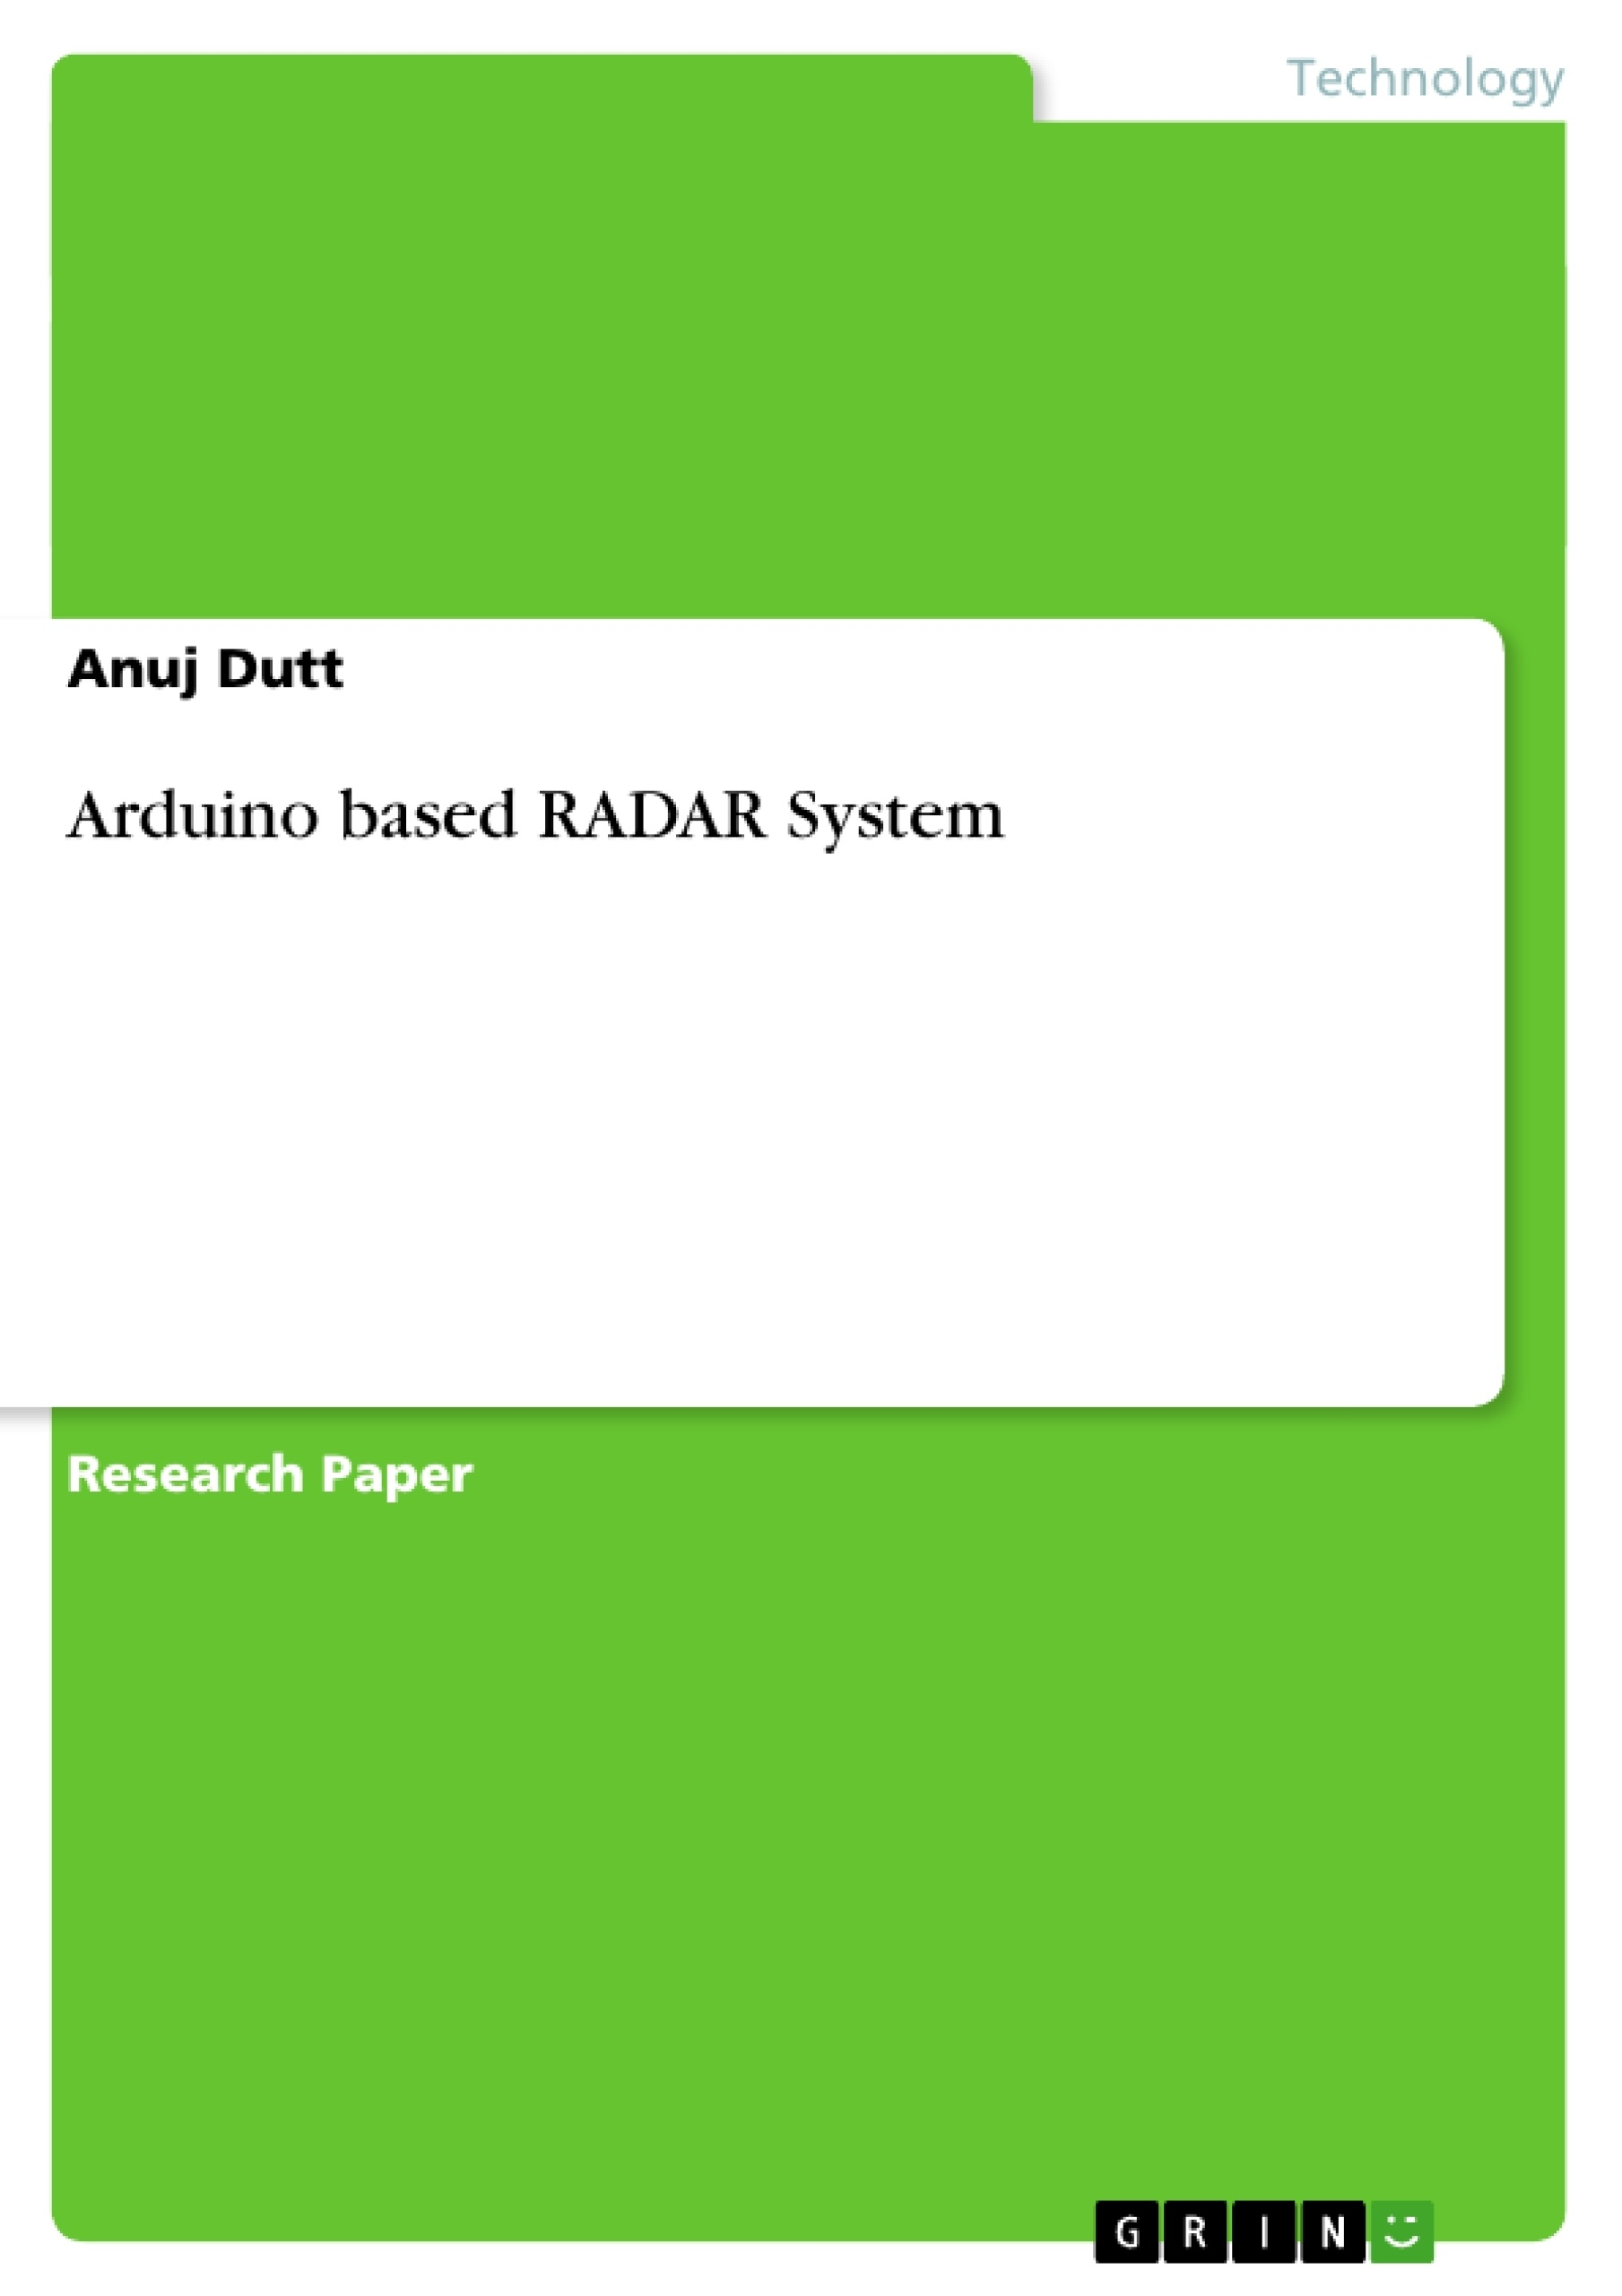 GRIN - Arduino based RADAR System